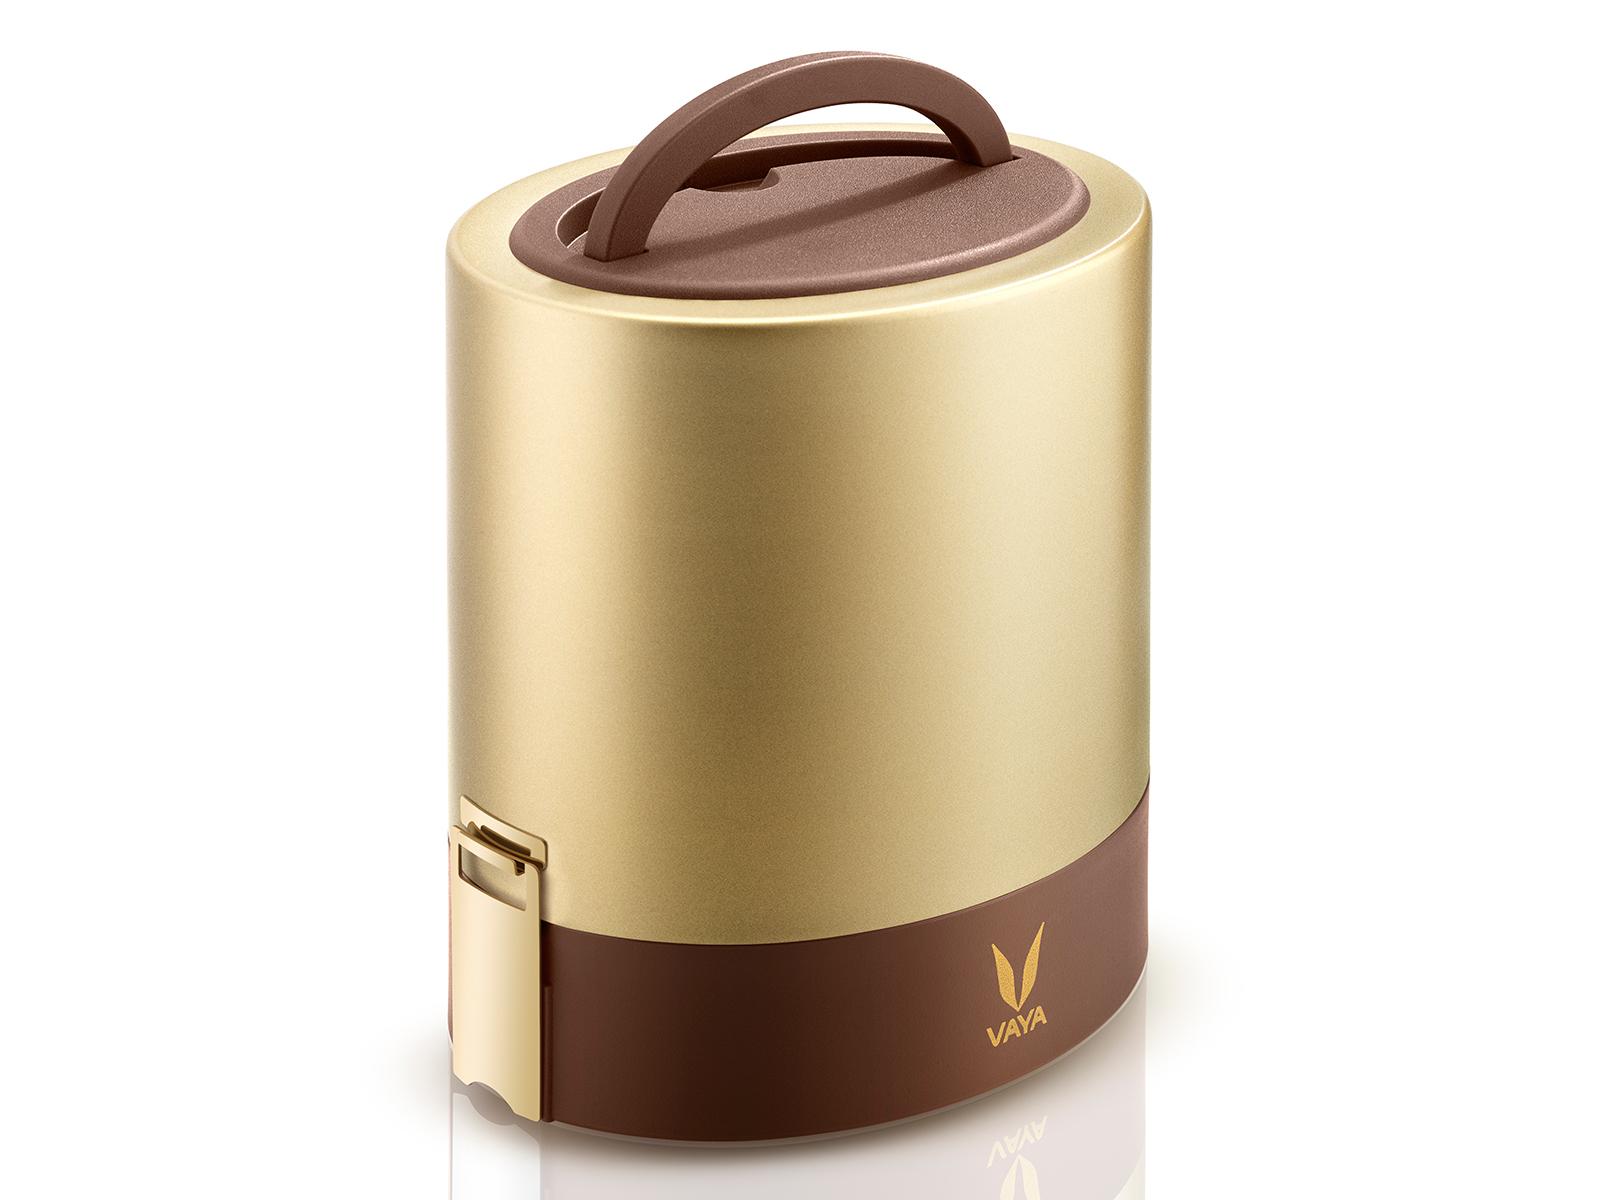 vaya lunch box